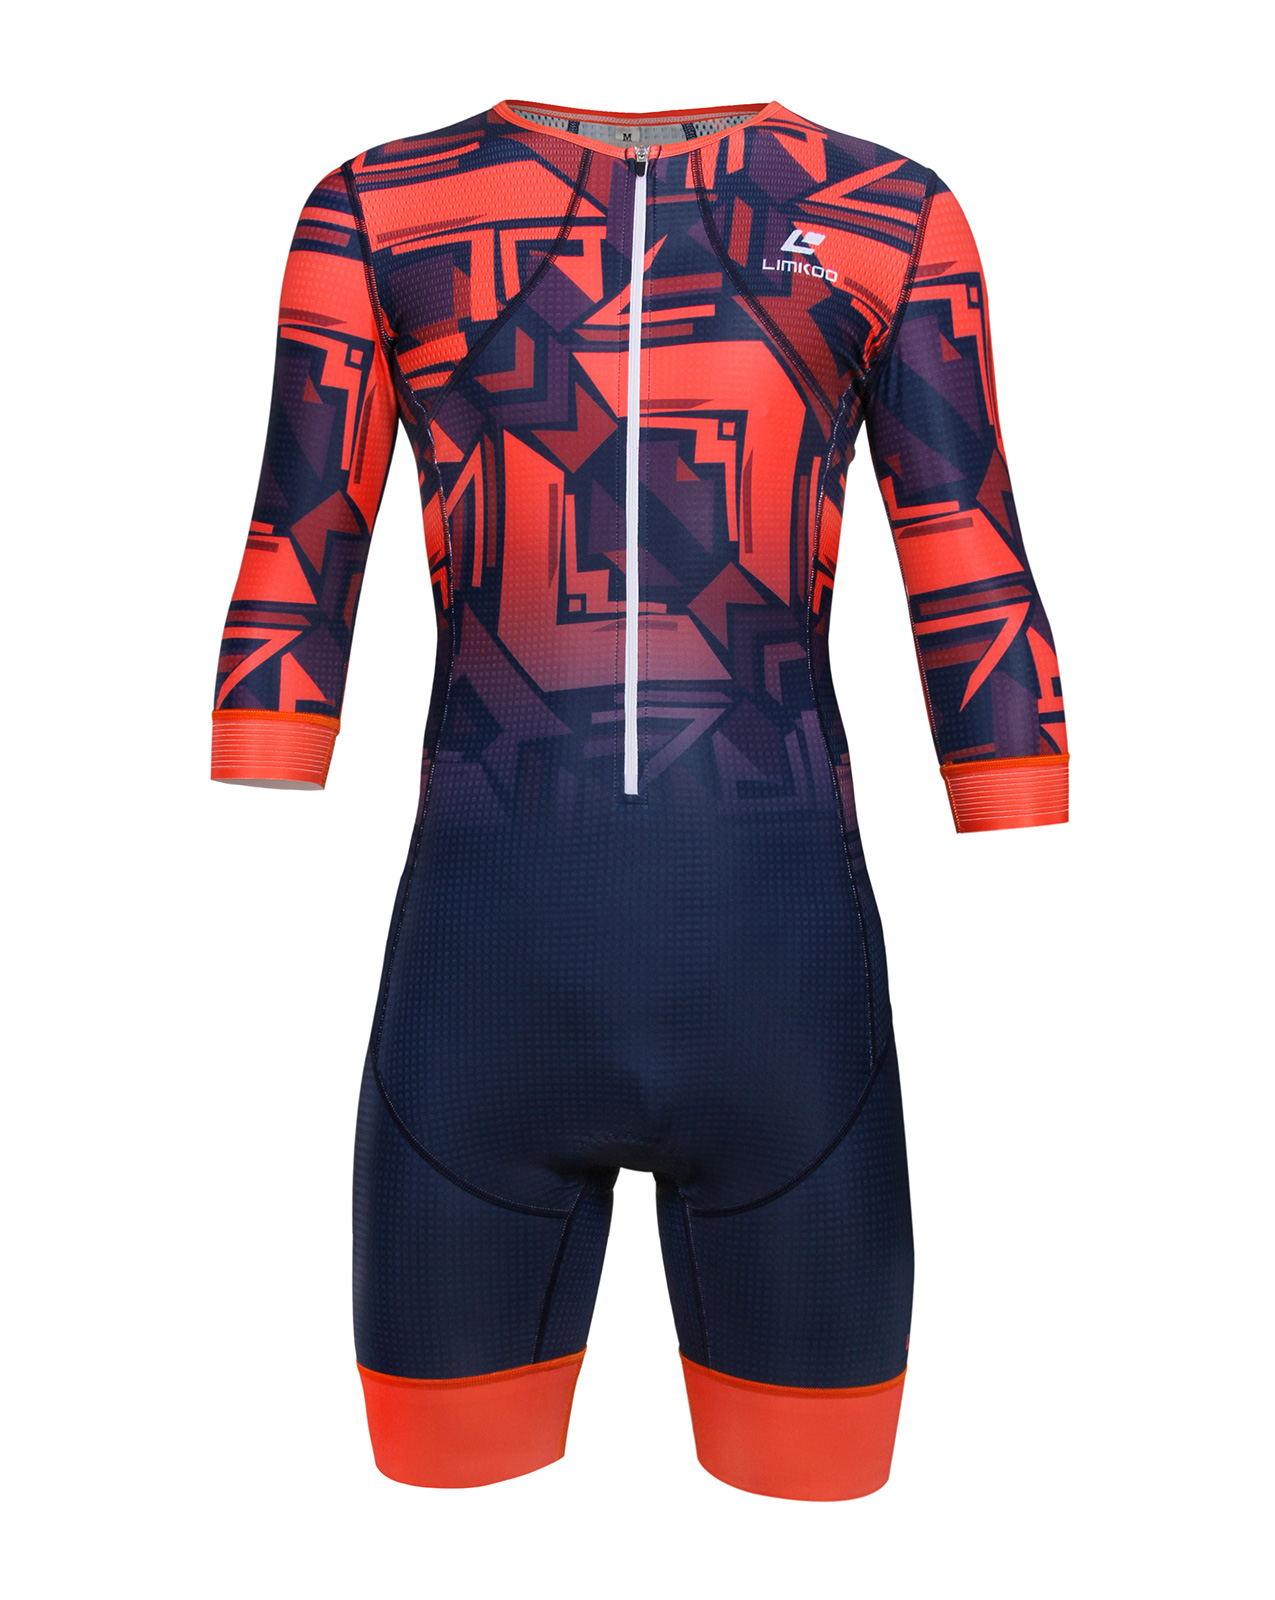 049c3621cd3 Swiss COLDBLACK HYDRO Men Shot Sleeve Tri Suit